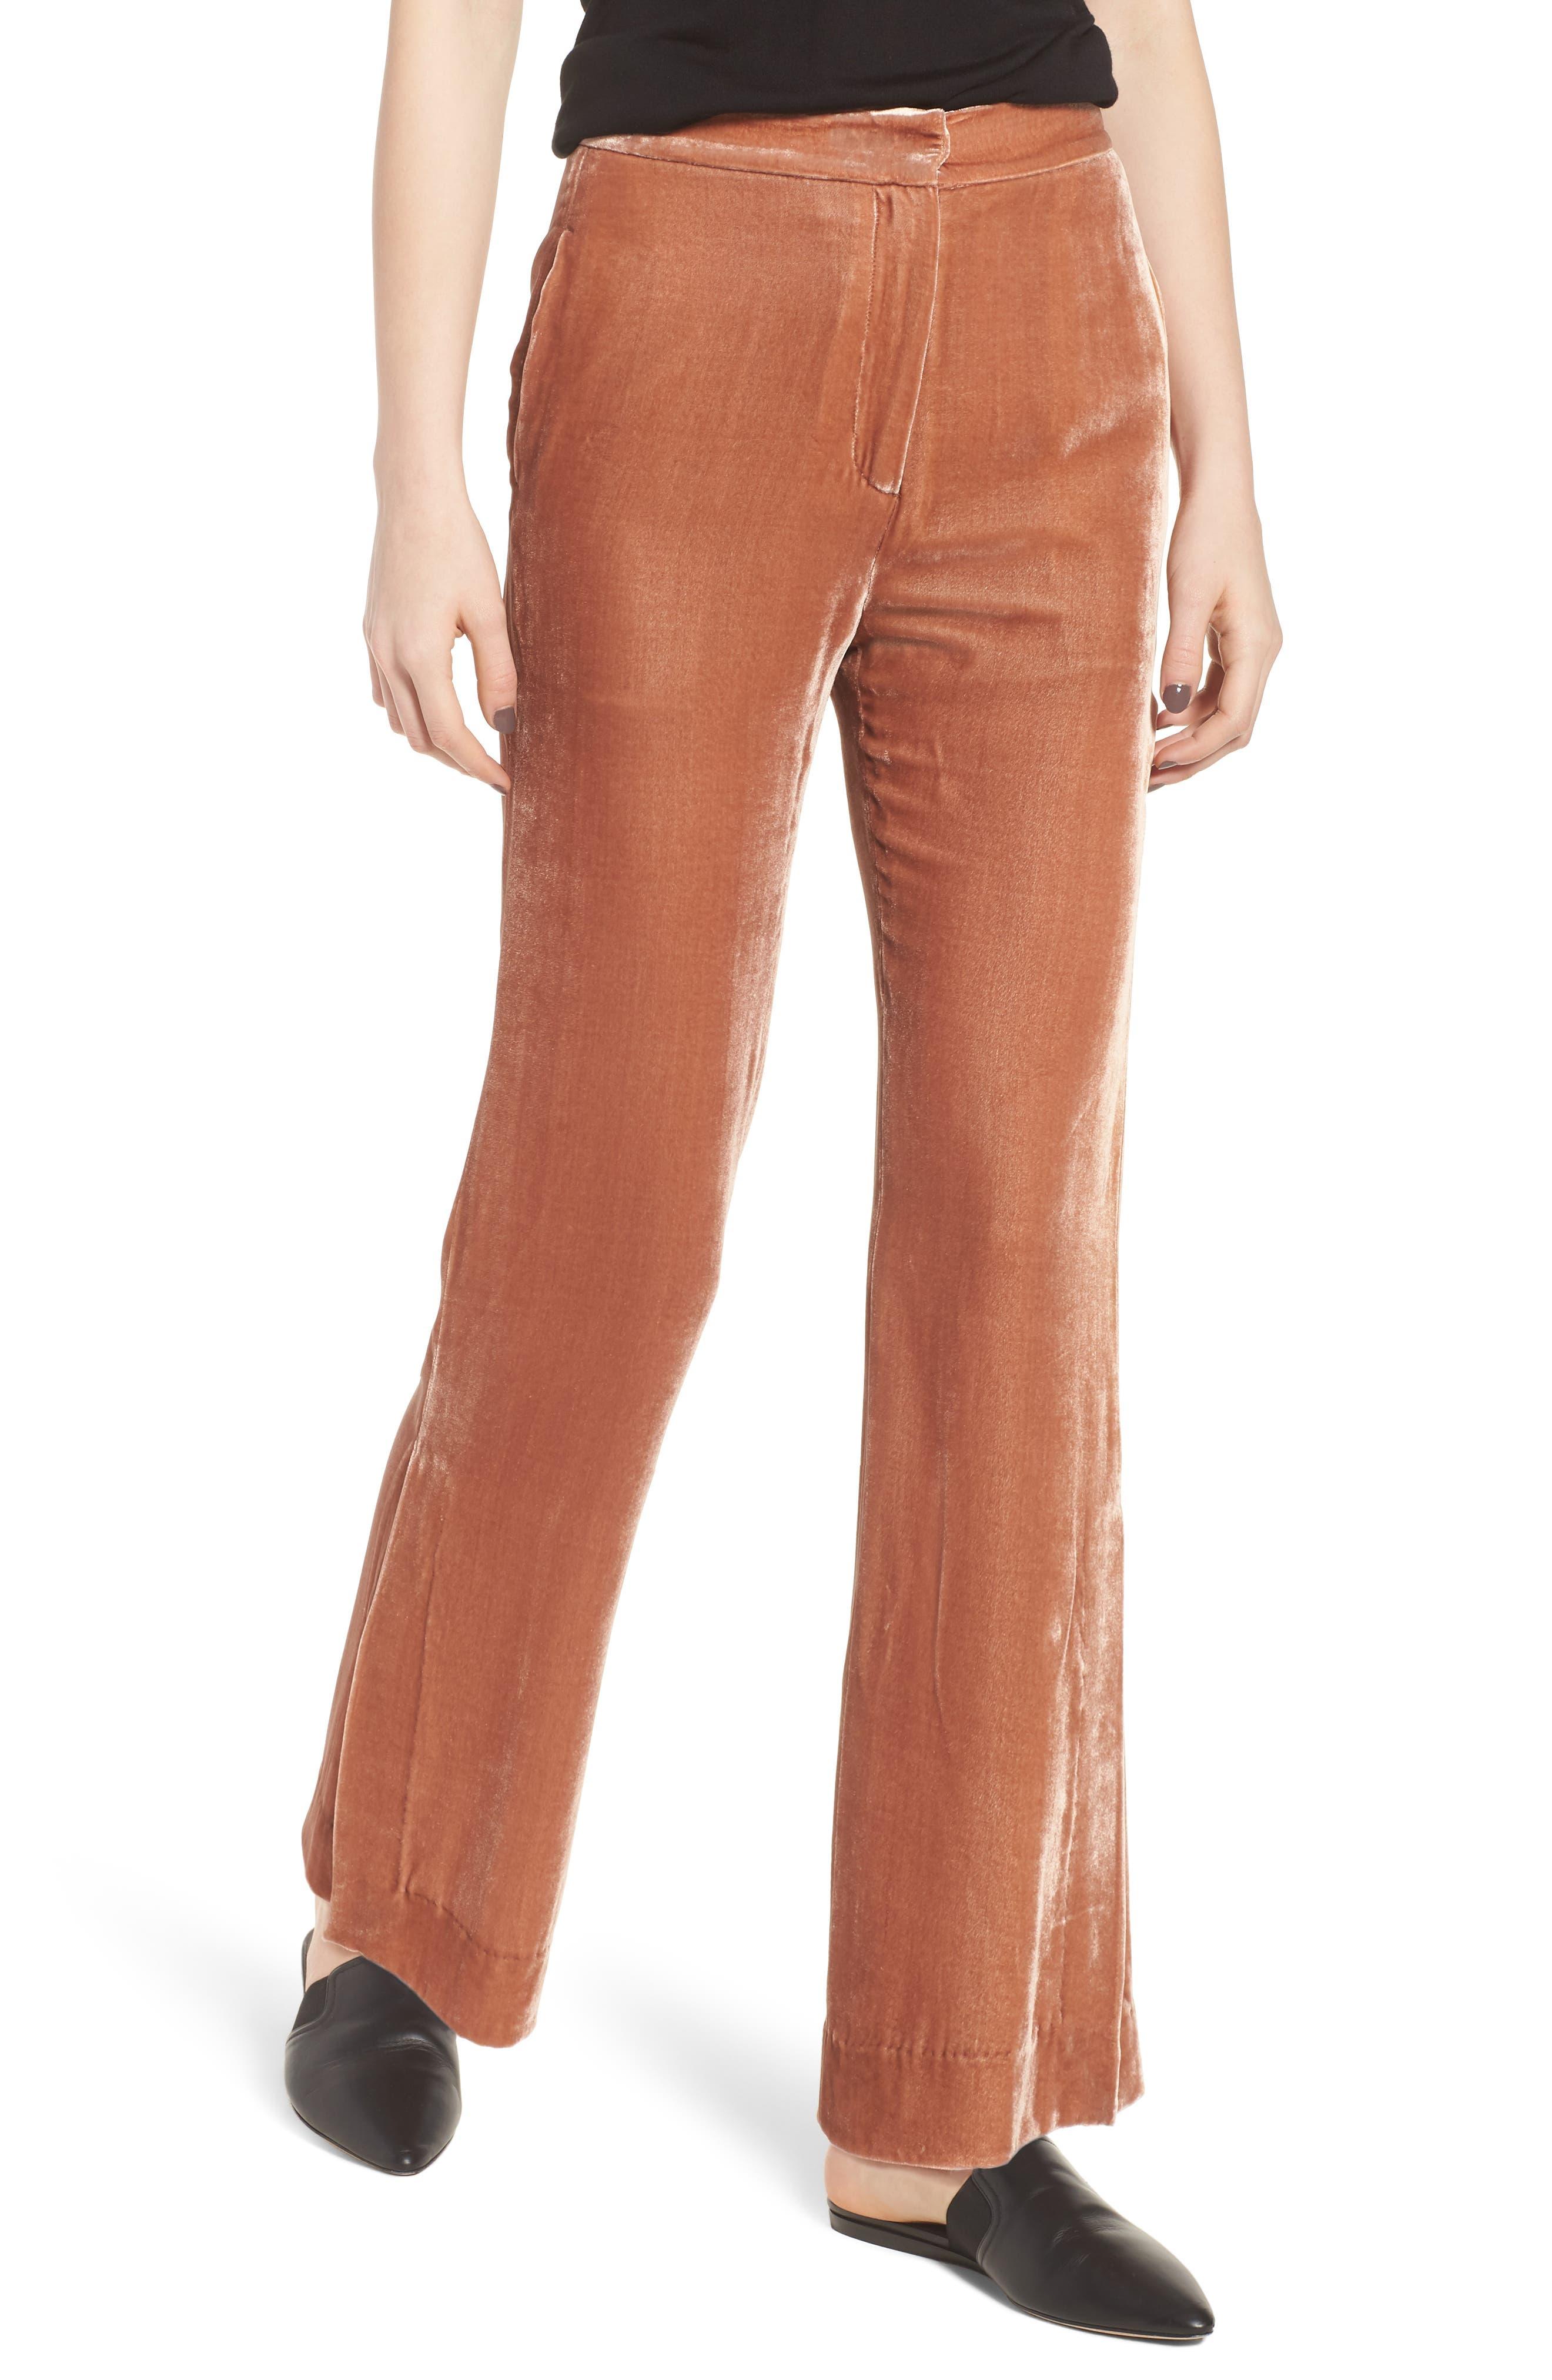 Bushwick Velvet Pants,                         Main,                         color, Brown